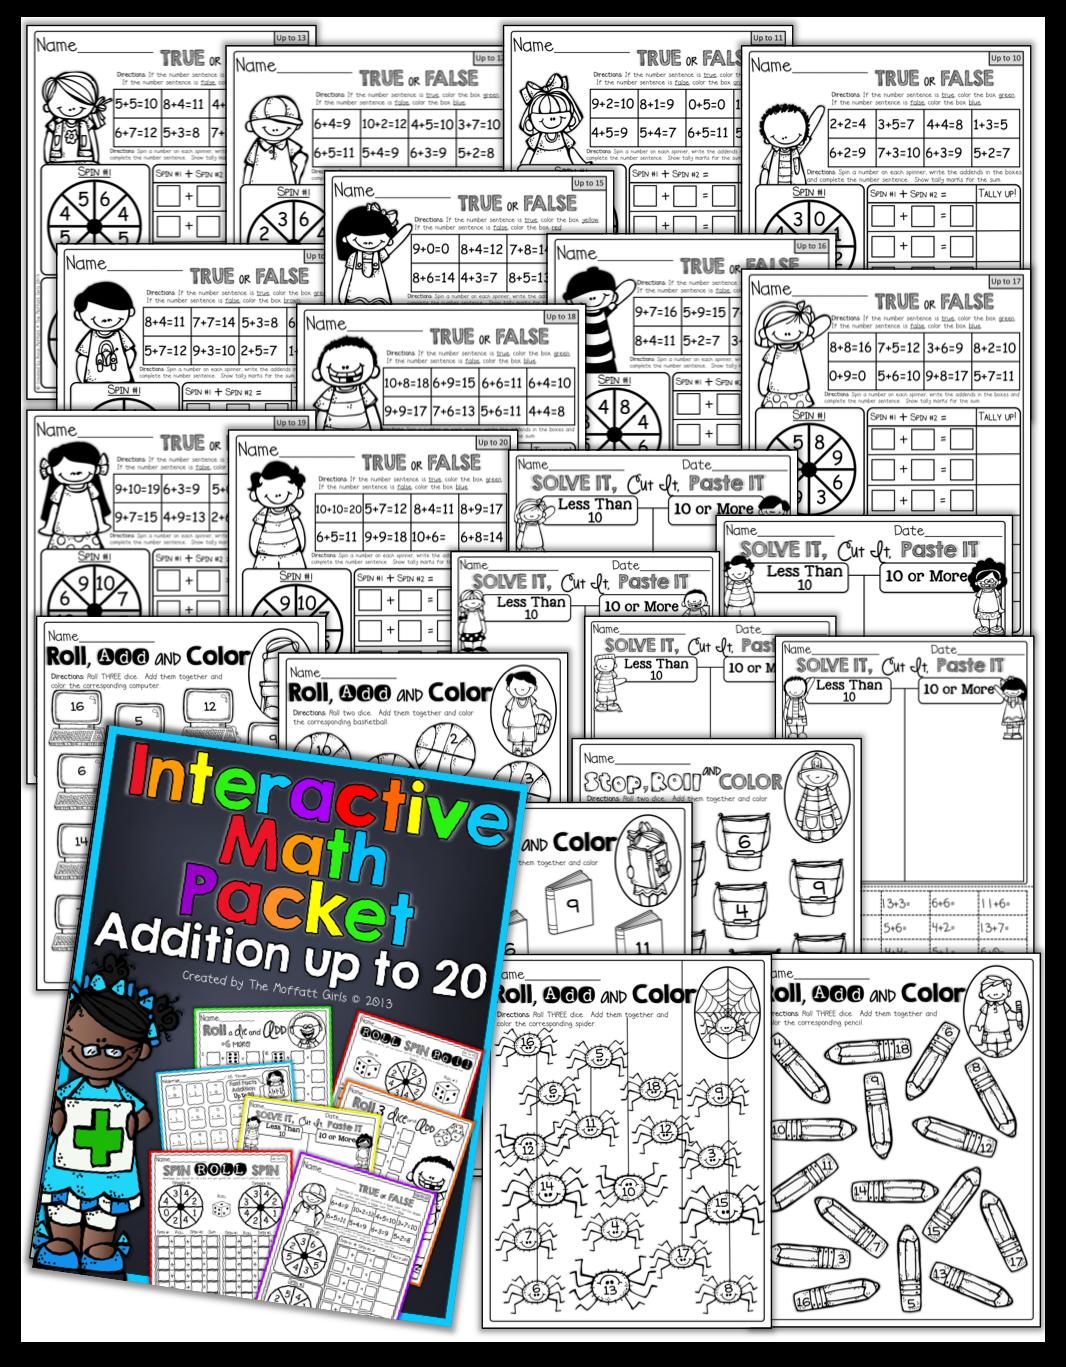 Interactive Math Makes Learning Fun